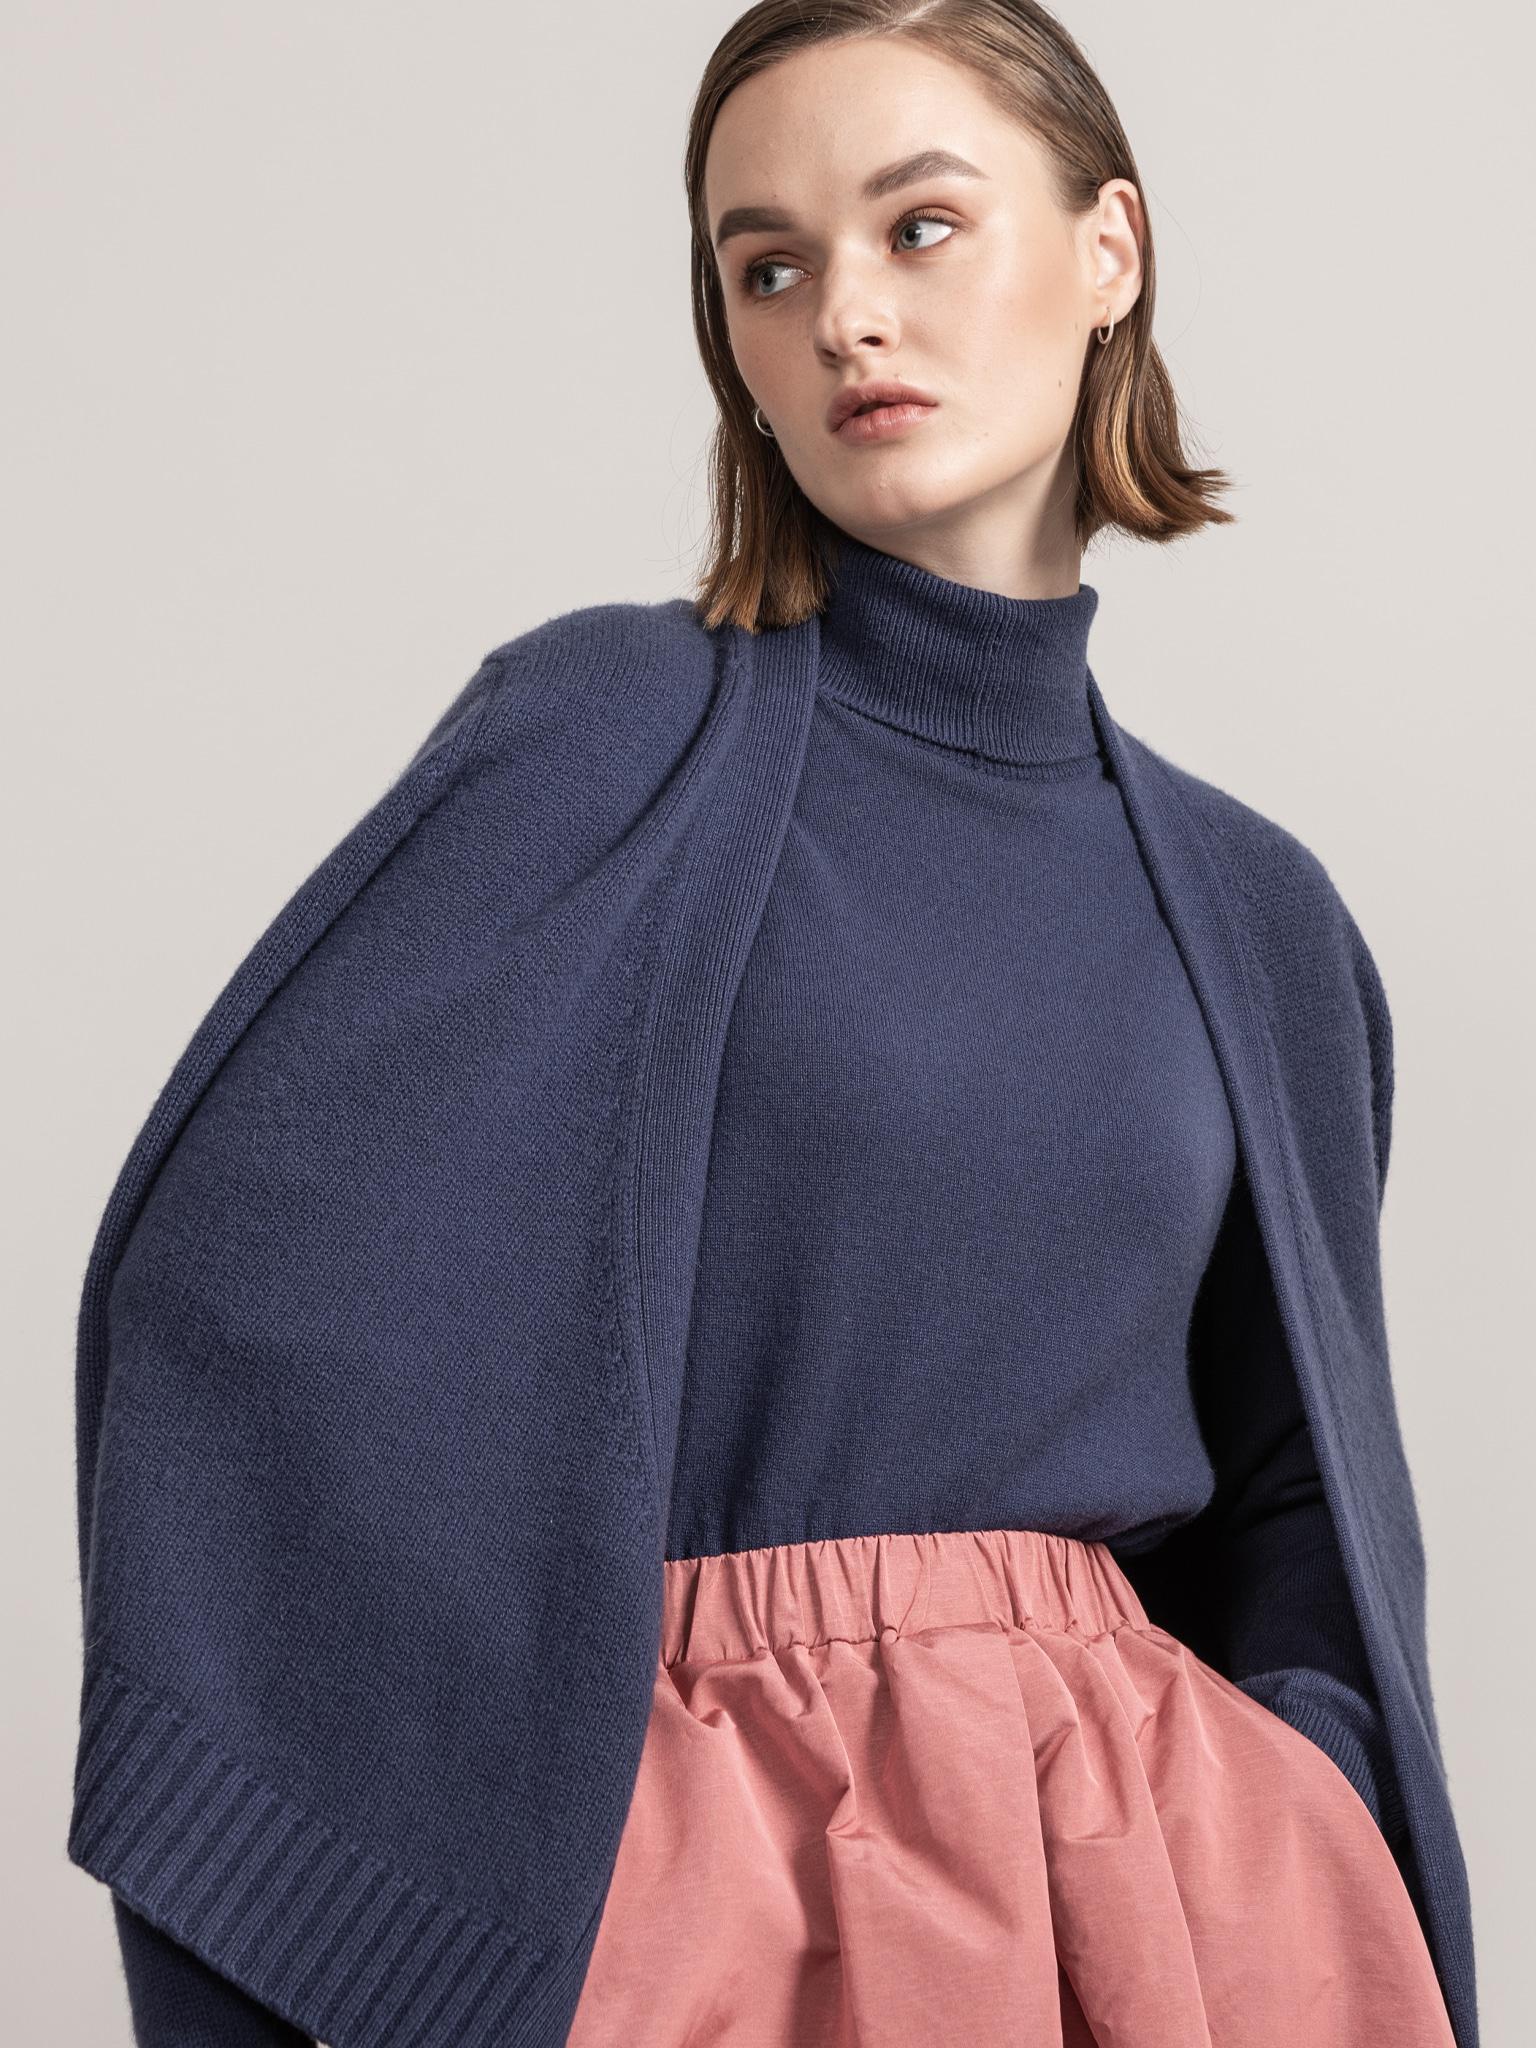 ROYAL Collection. Loro Piana Cashmere 100% V Neck Wrap Cardigan